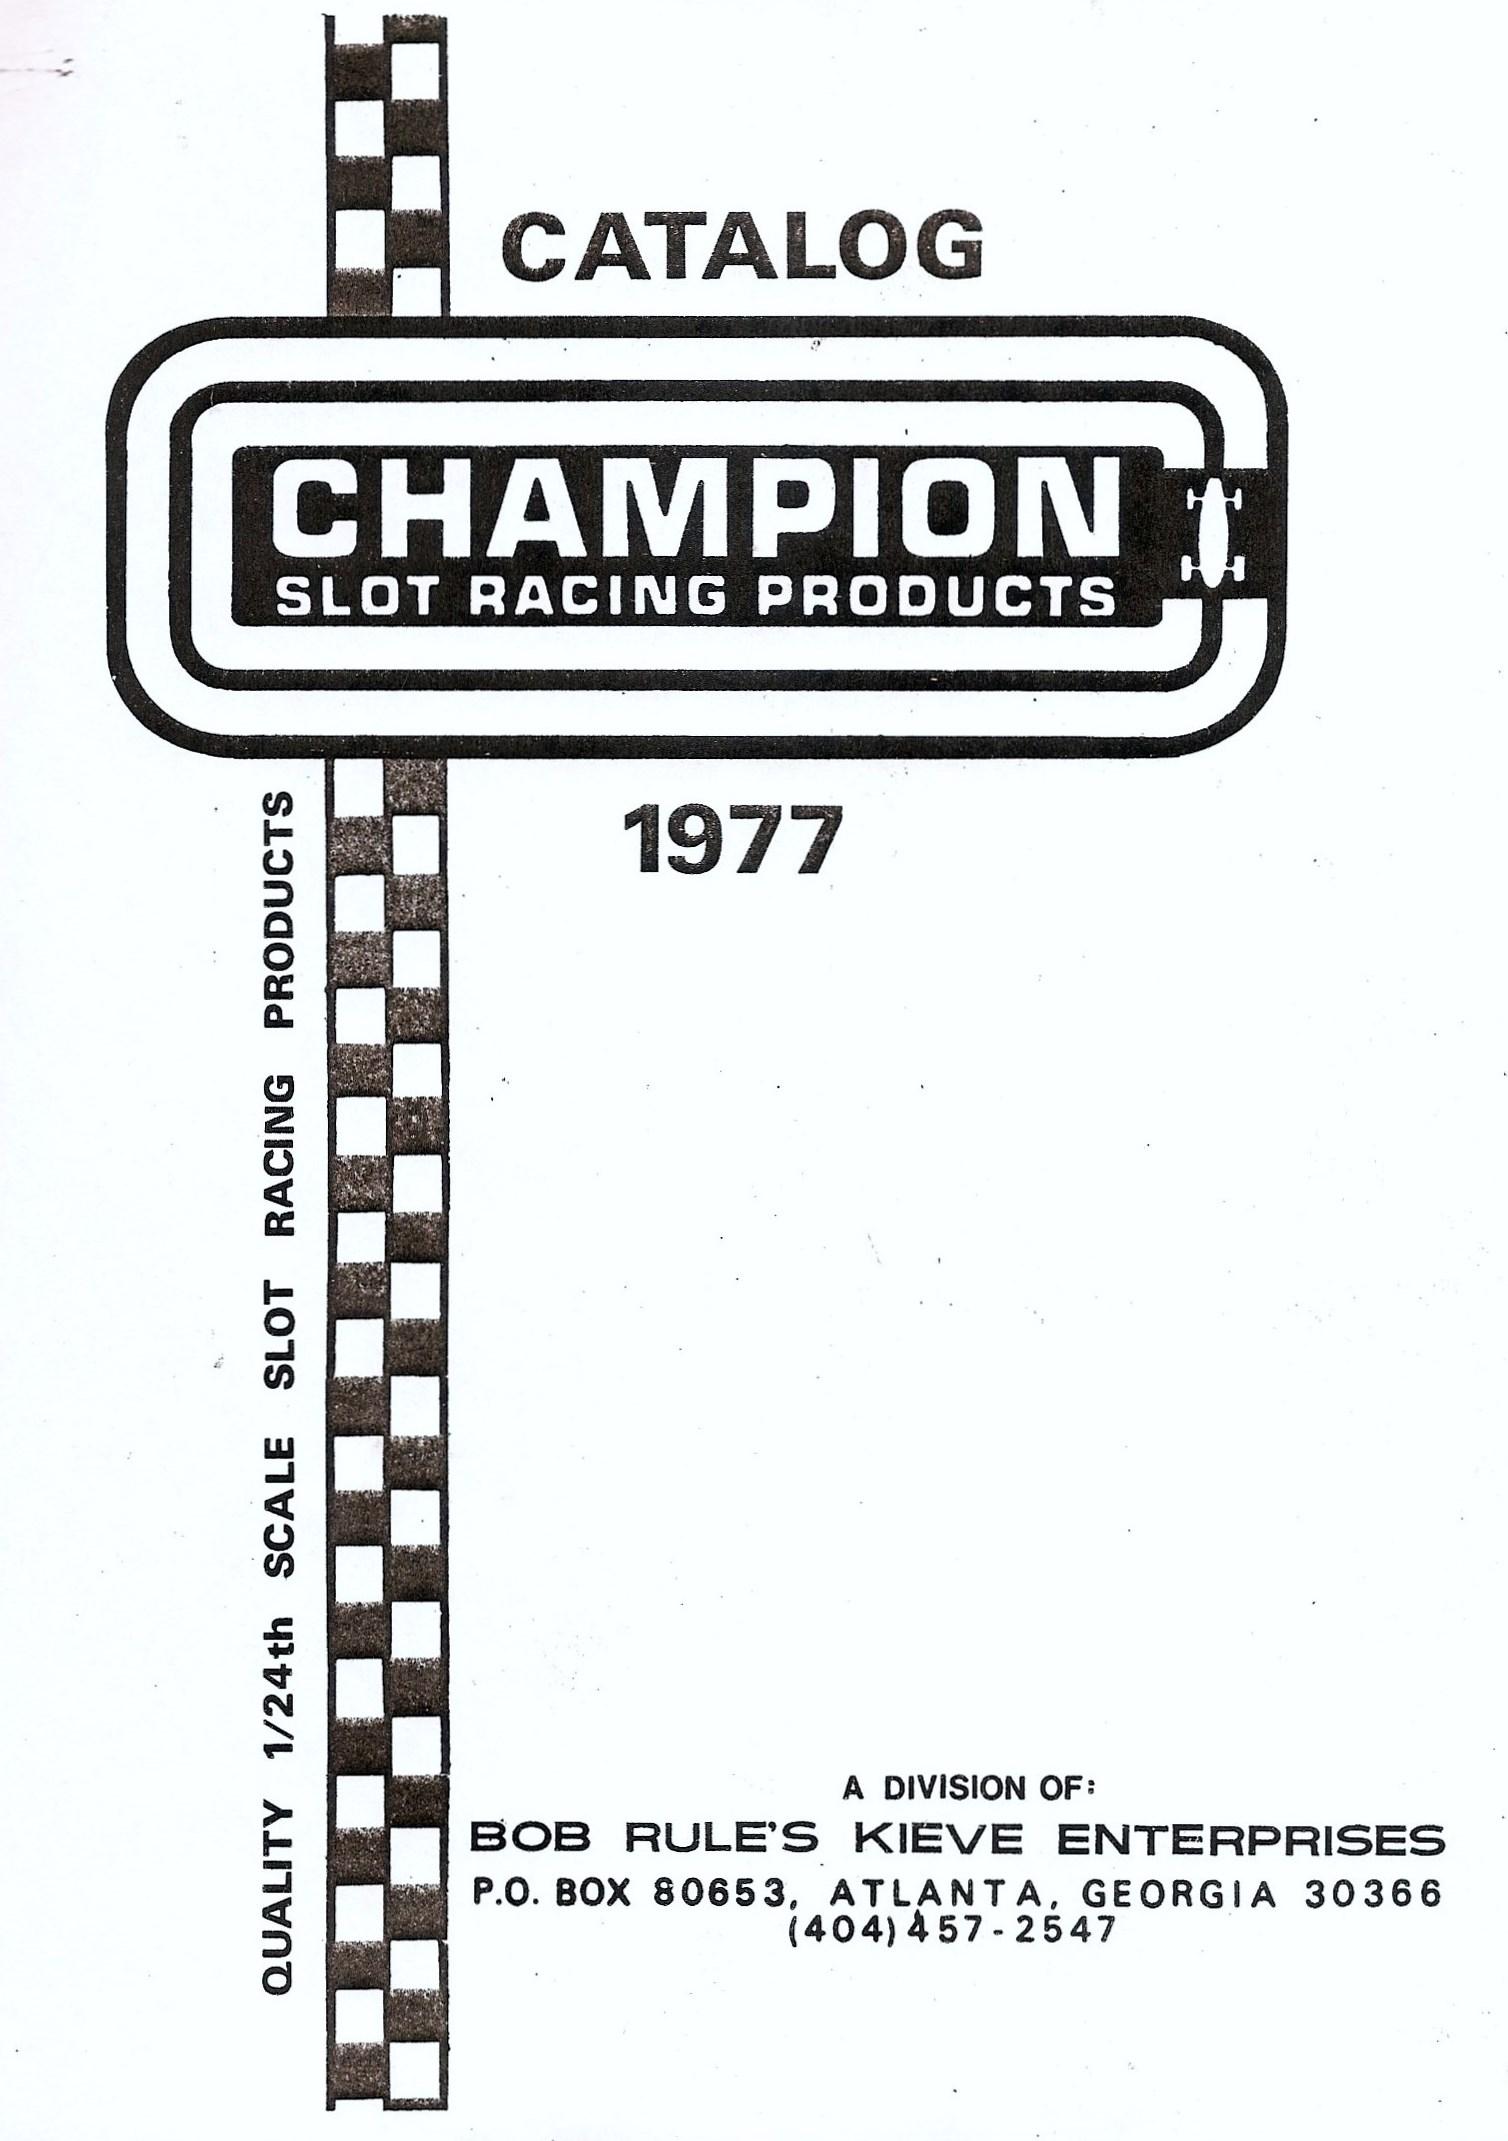 1977 Champion Catalog0004.jpg